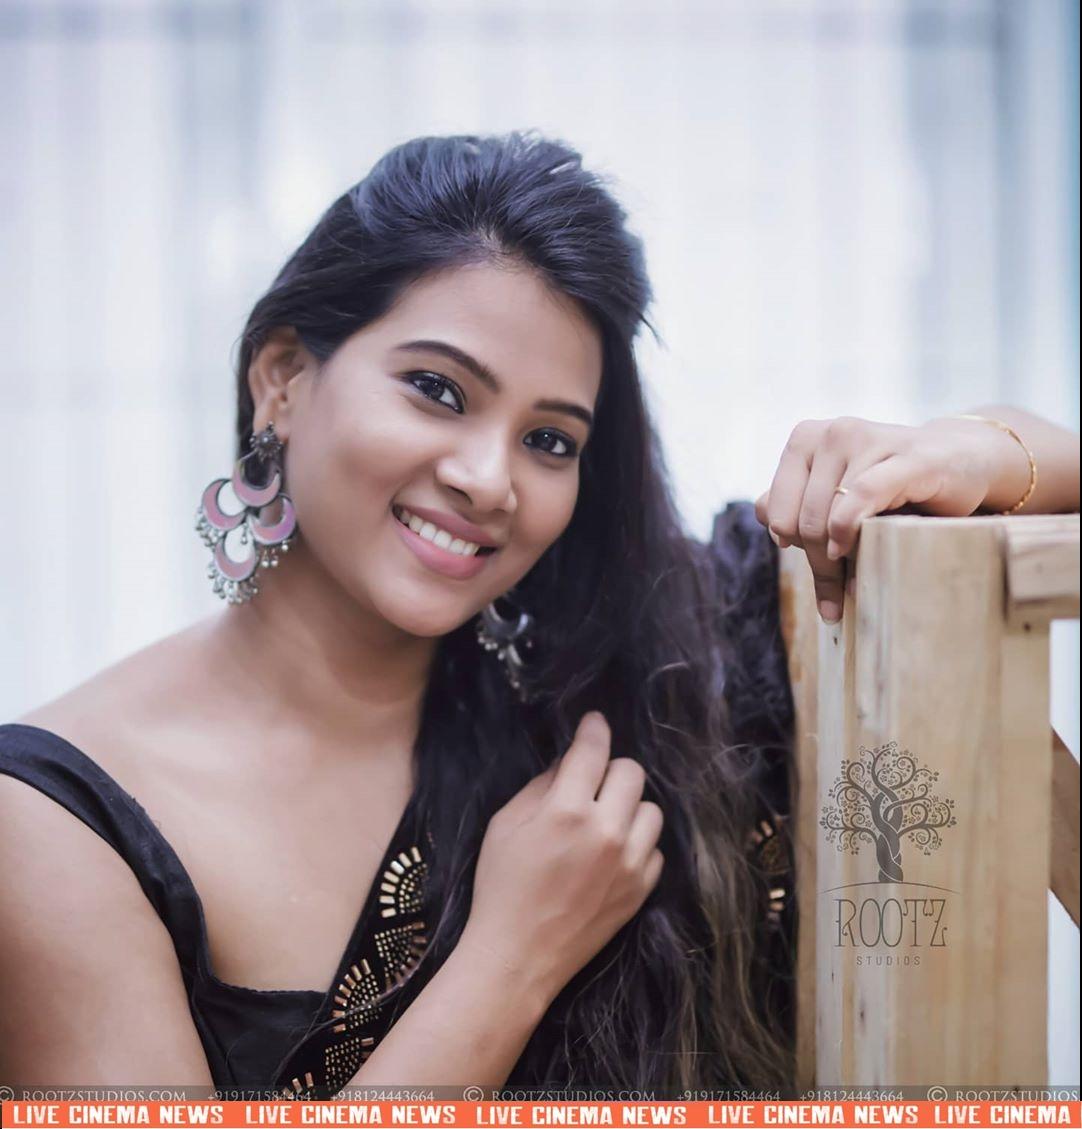 dhivya dhuraisamy homely saree photos (10)